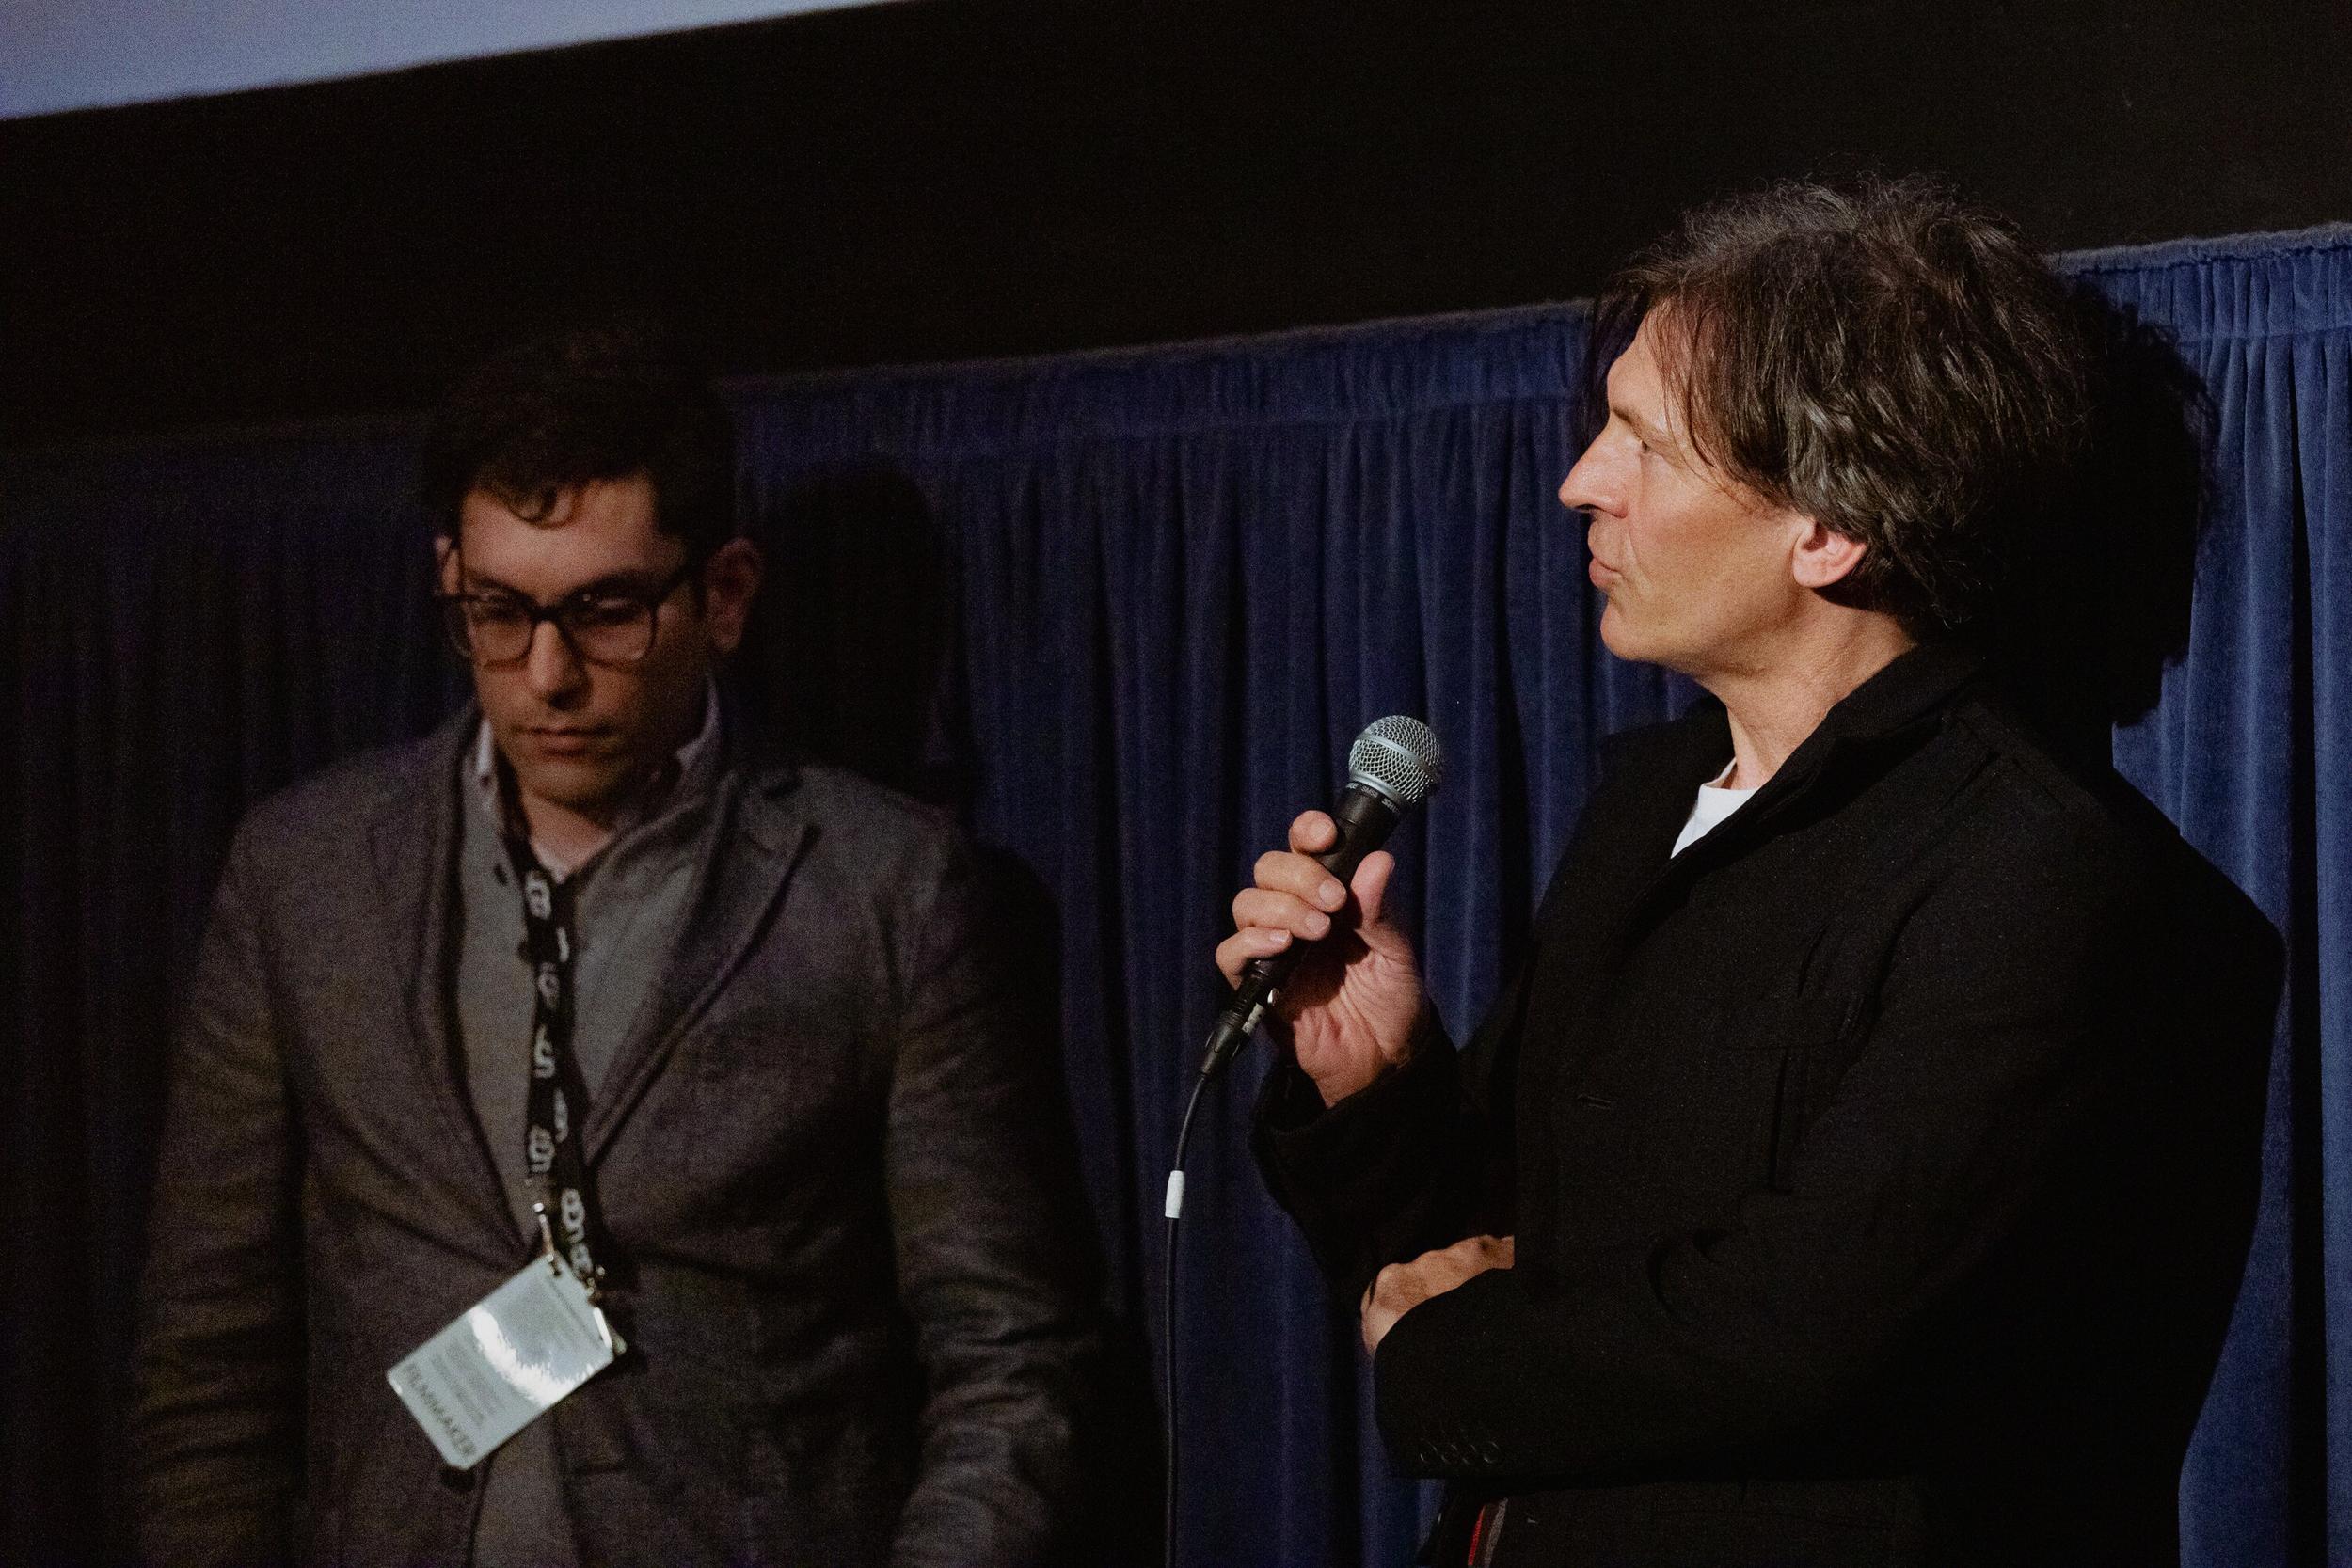 Composer Adam Peters at the Santa Barbara International Film Festival Q&A. (Photo by @ClovisIV)